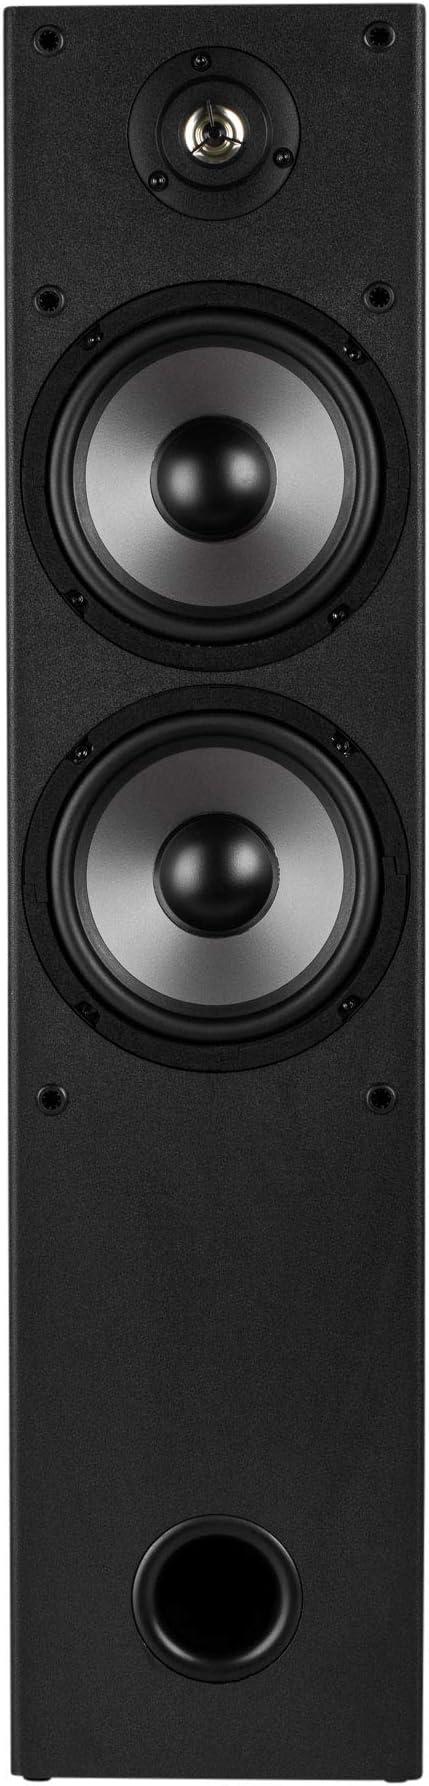 Dayton Audio T652 Dual 6-1/2